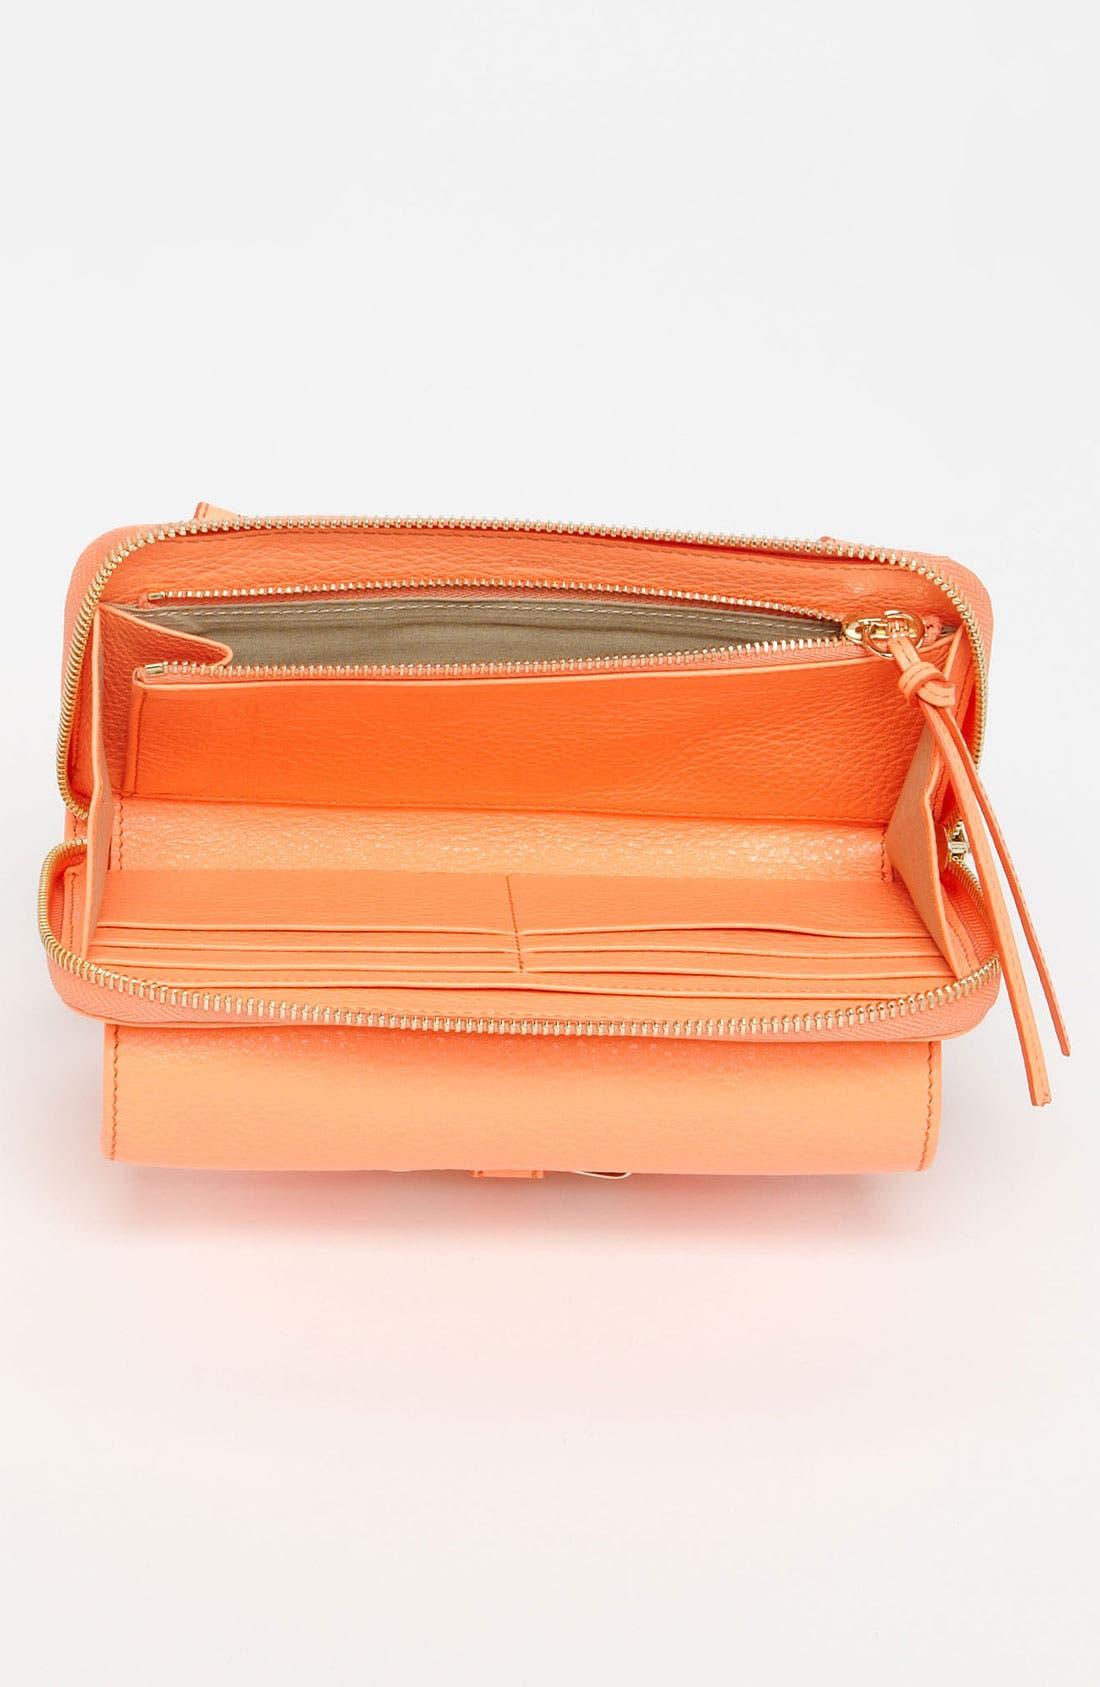 Alternate Image 3  - Chloé 'Lily - Long' Sunglasses Case & Crossbody Wallet